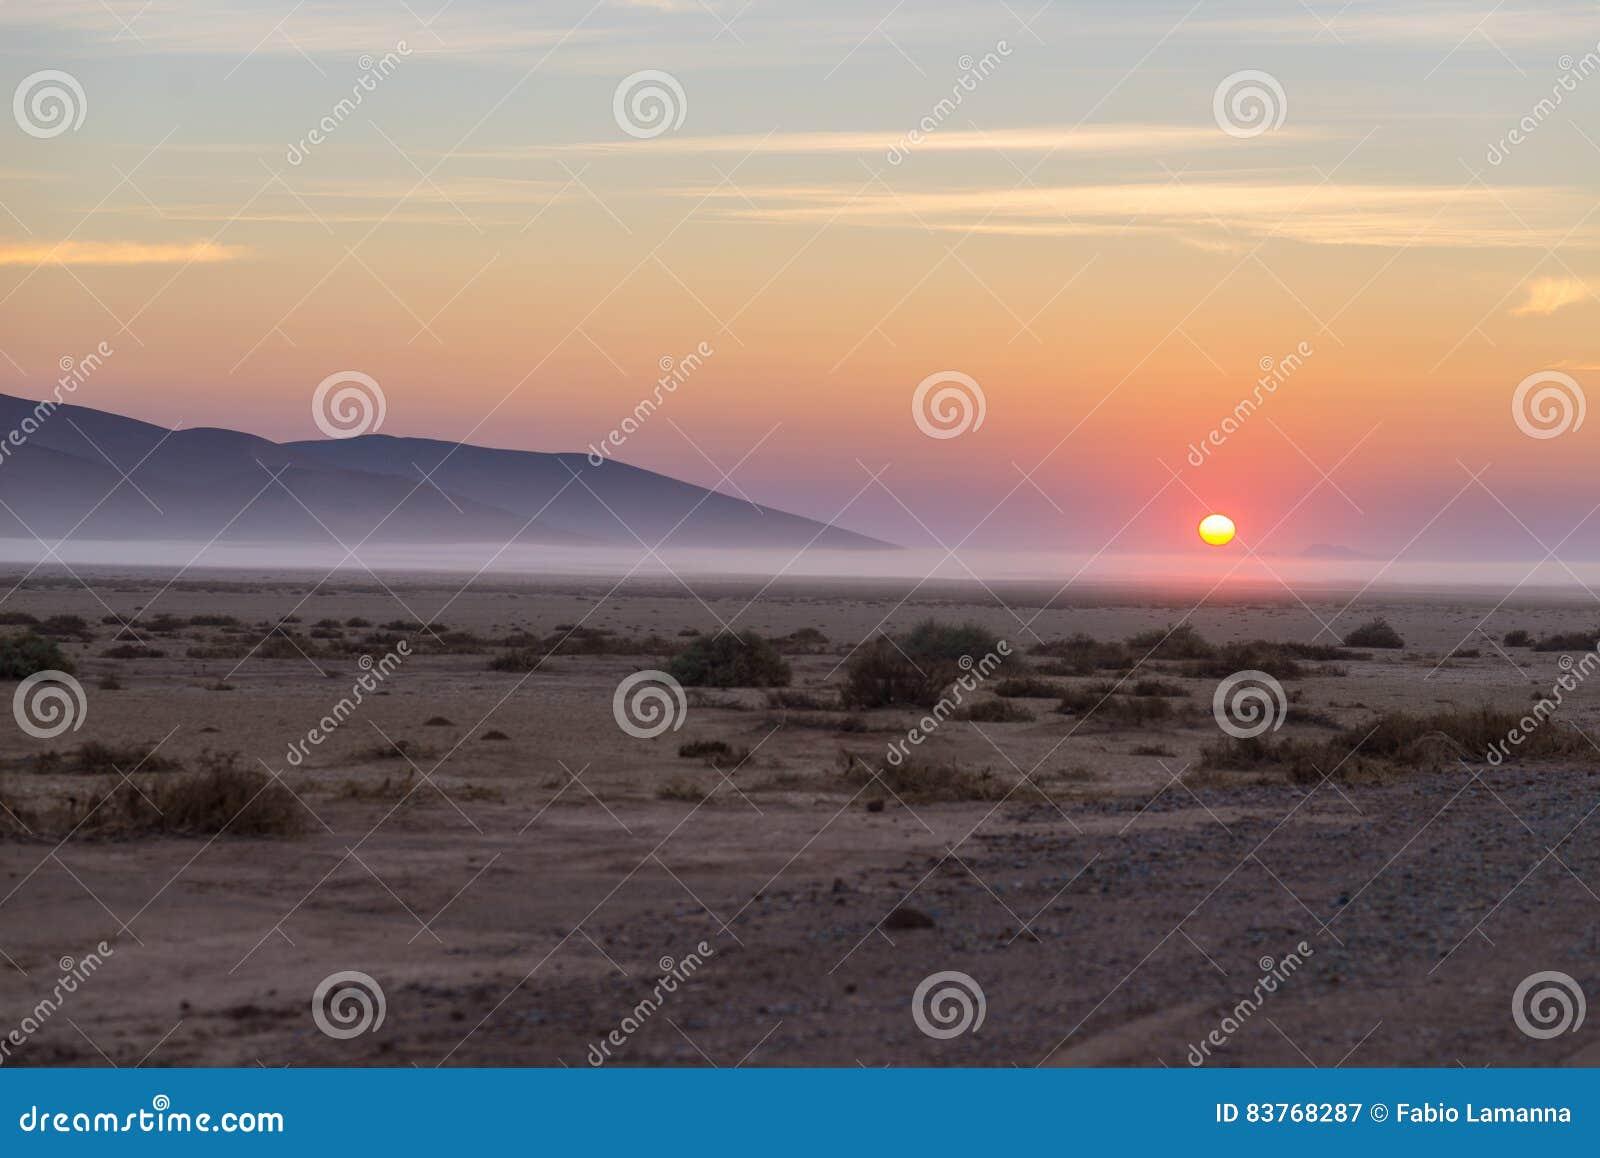 Zonsopgang over de Namib-woestijn, roadtrip in het prachtige Nationale Park van Namib Naukluft, reisbestemming in Namibië, Afrika